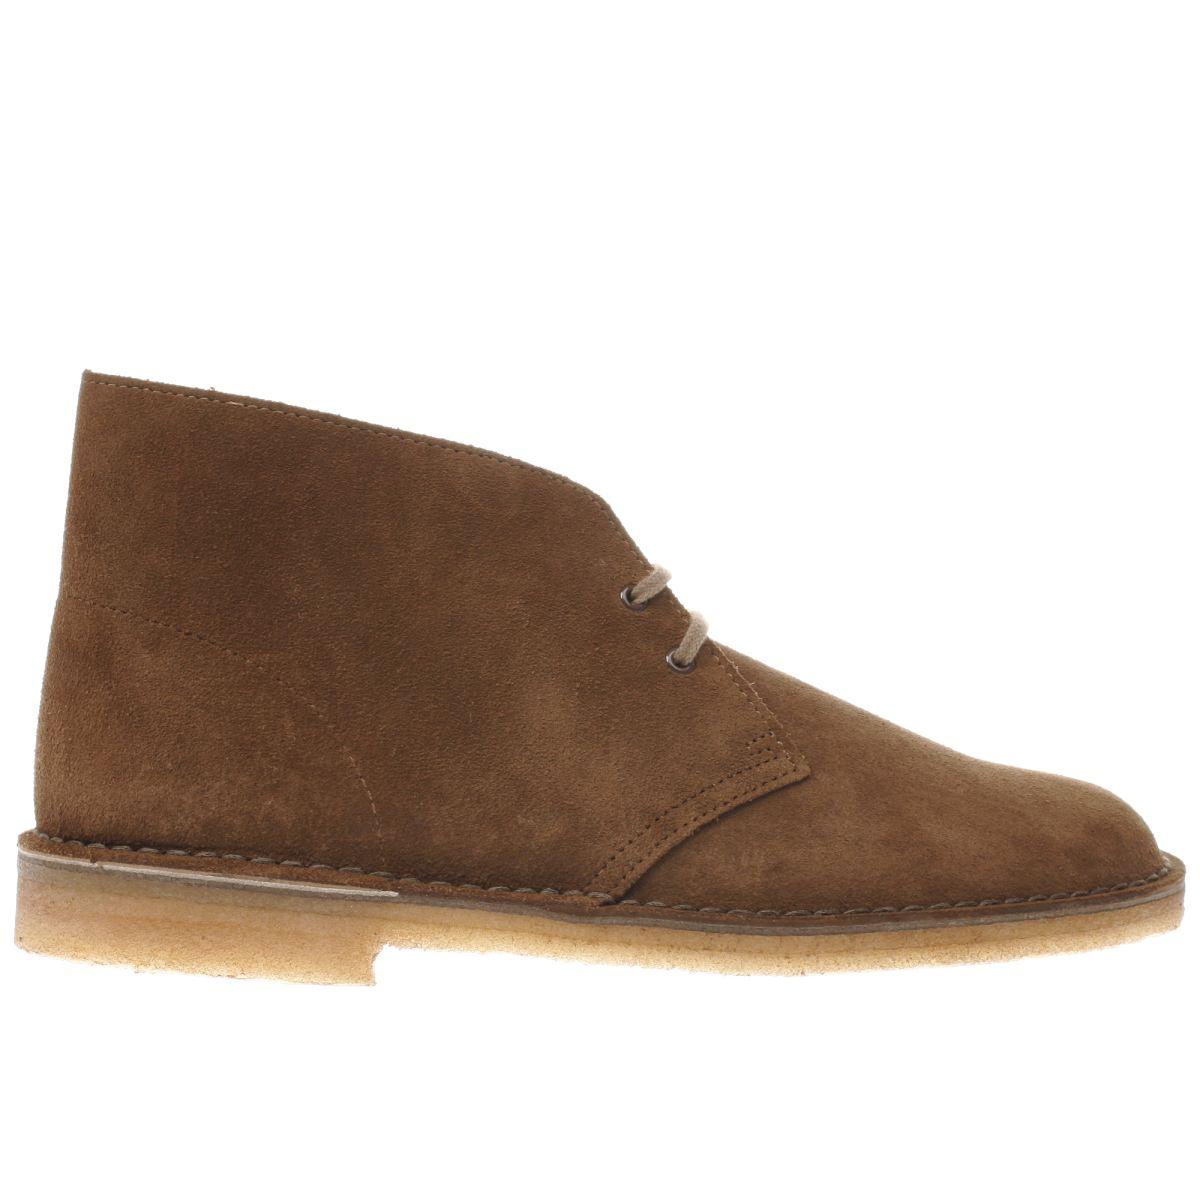 Wallabees on Feet | Clarks Wallabees Men | Clarks Women Boots